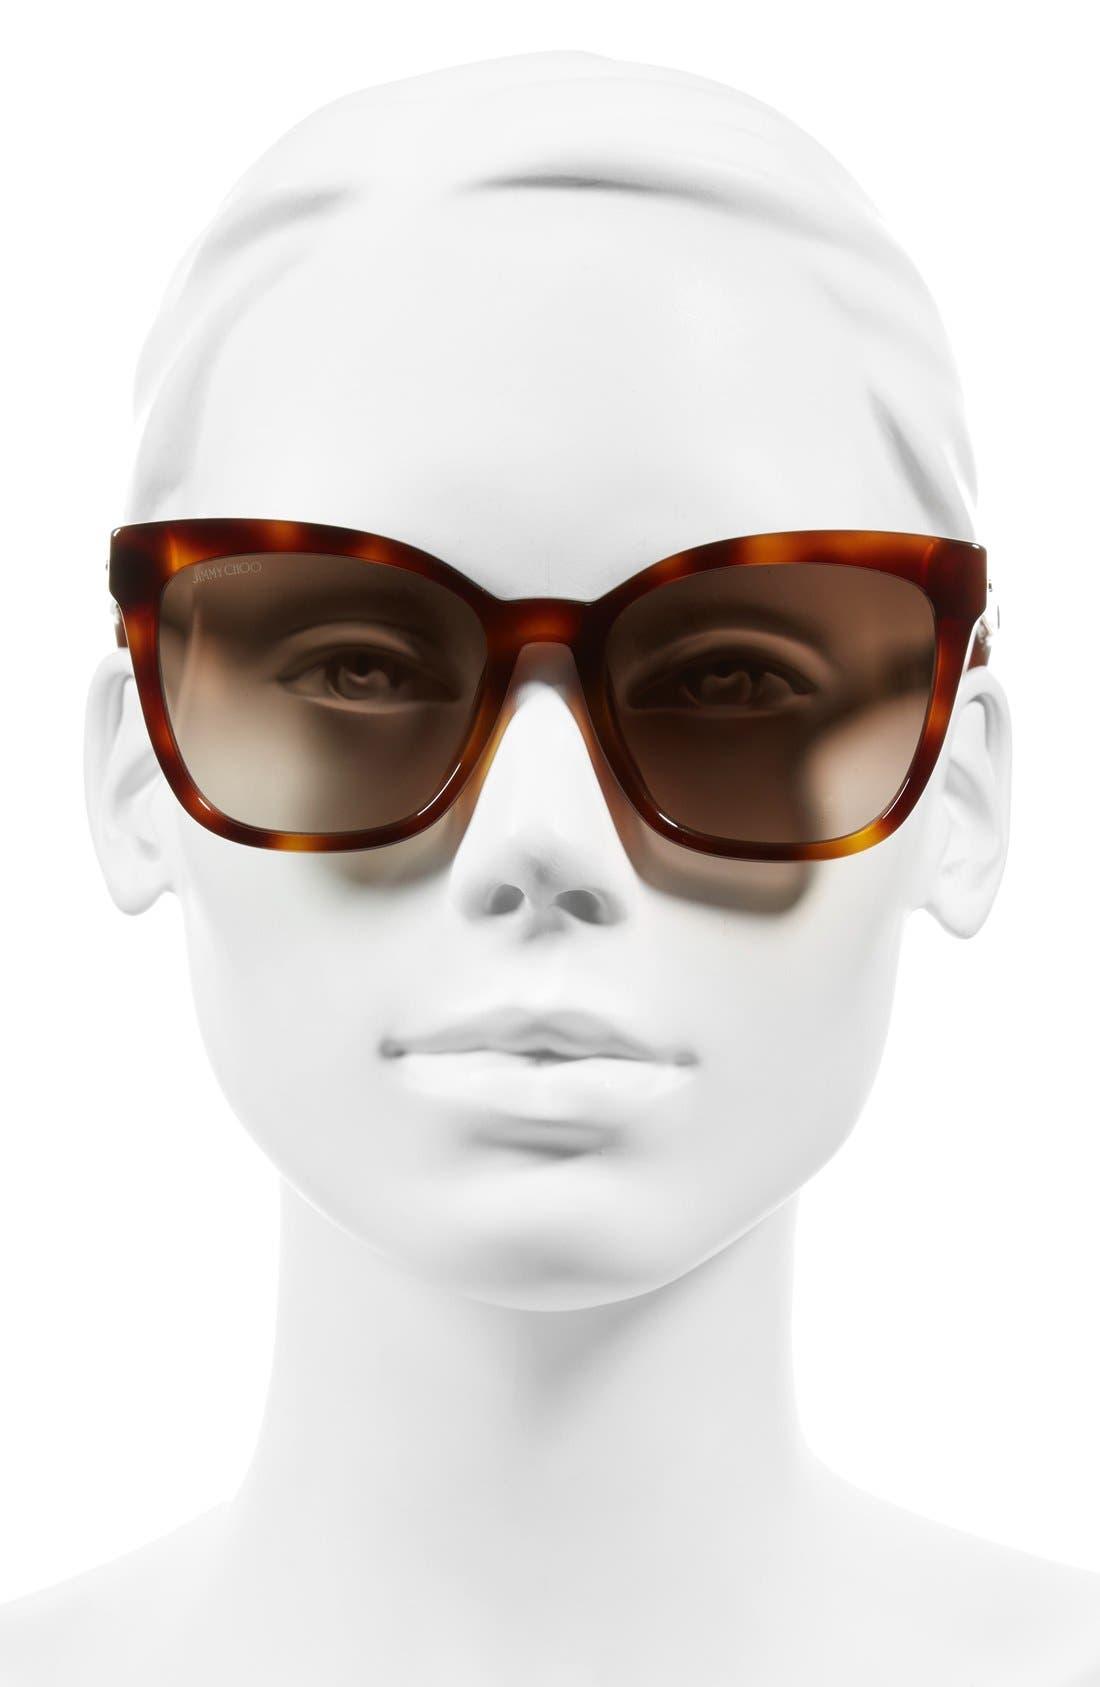 55mm Retro Sunglasses,                             Alternate thumbnail 2, color,                             Havana